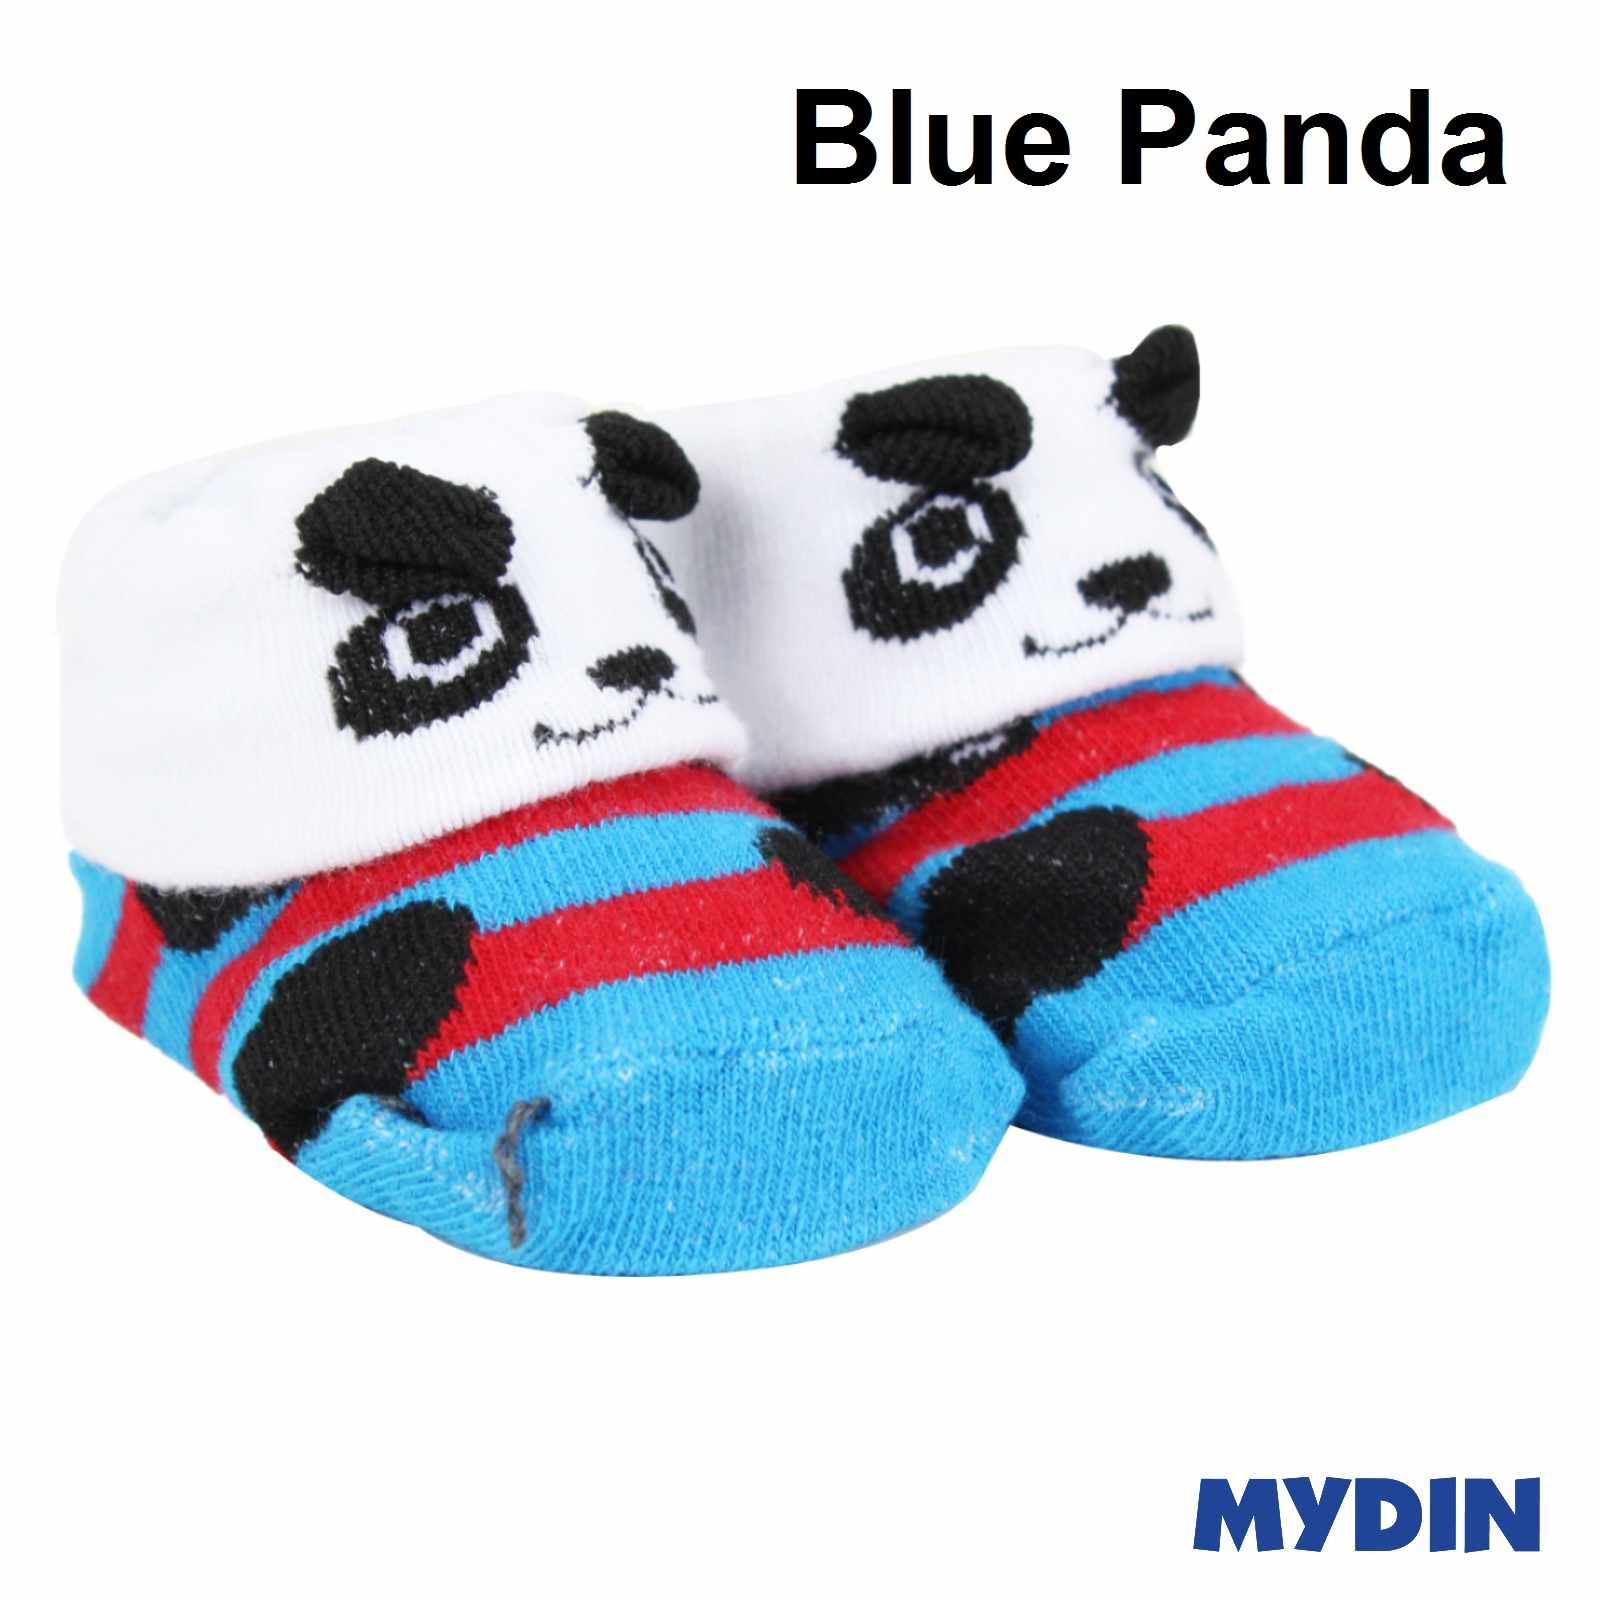 MYBB 3D Baby Socks 1219WYBNBP01 – 12 Designs